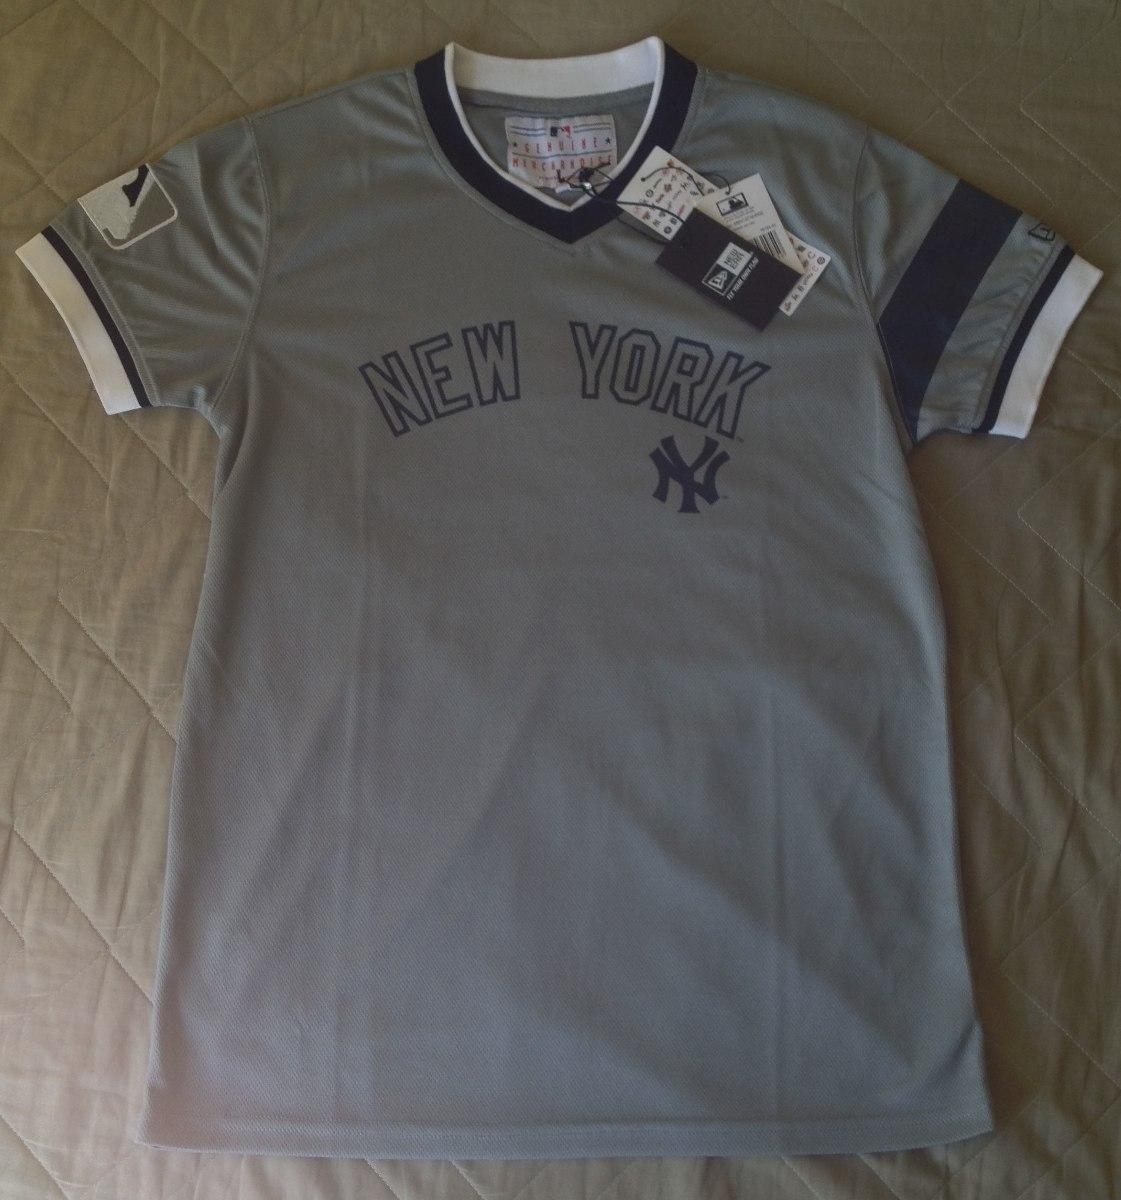 camiseta camisa new era mlb new york yankees original. Carregando zoom. bd9e9651cfb